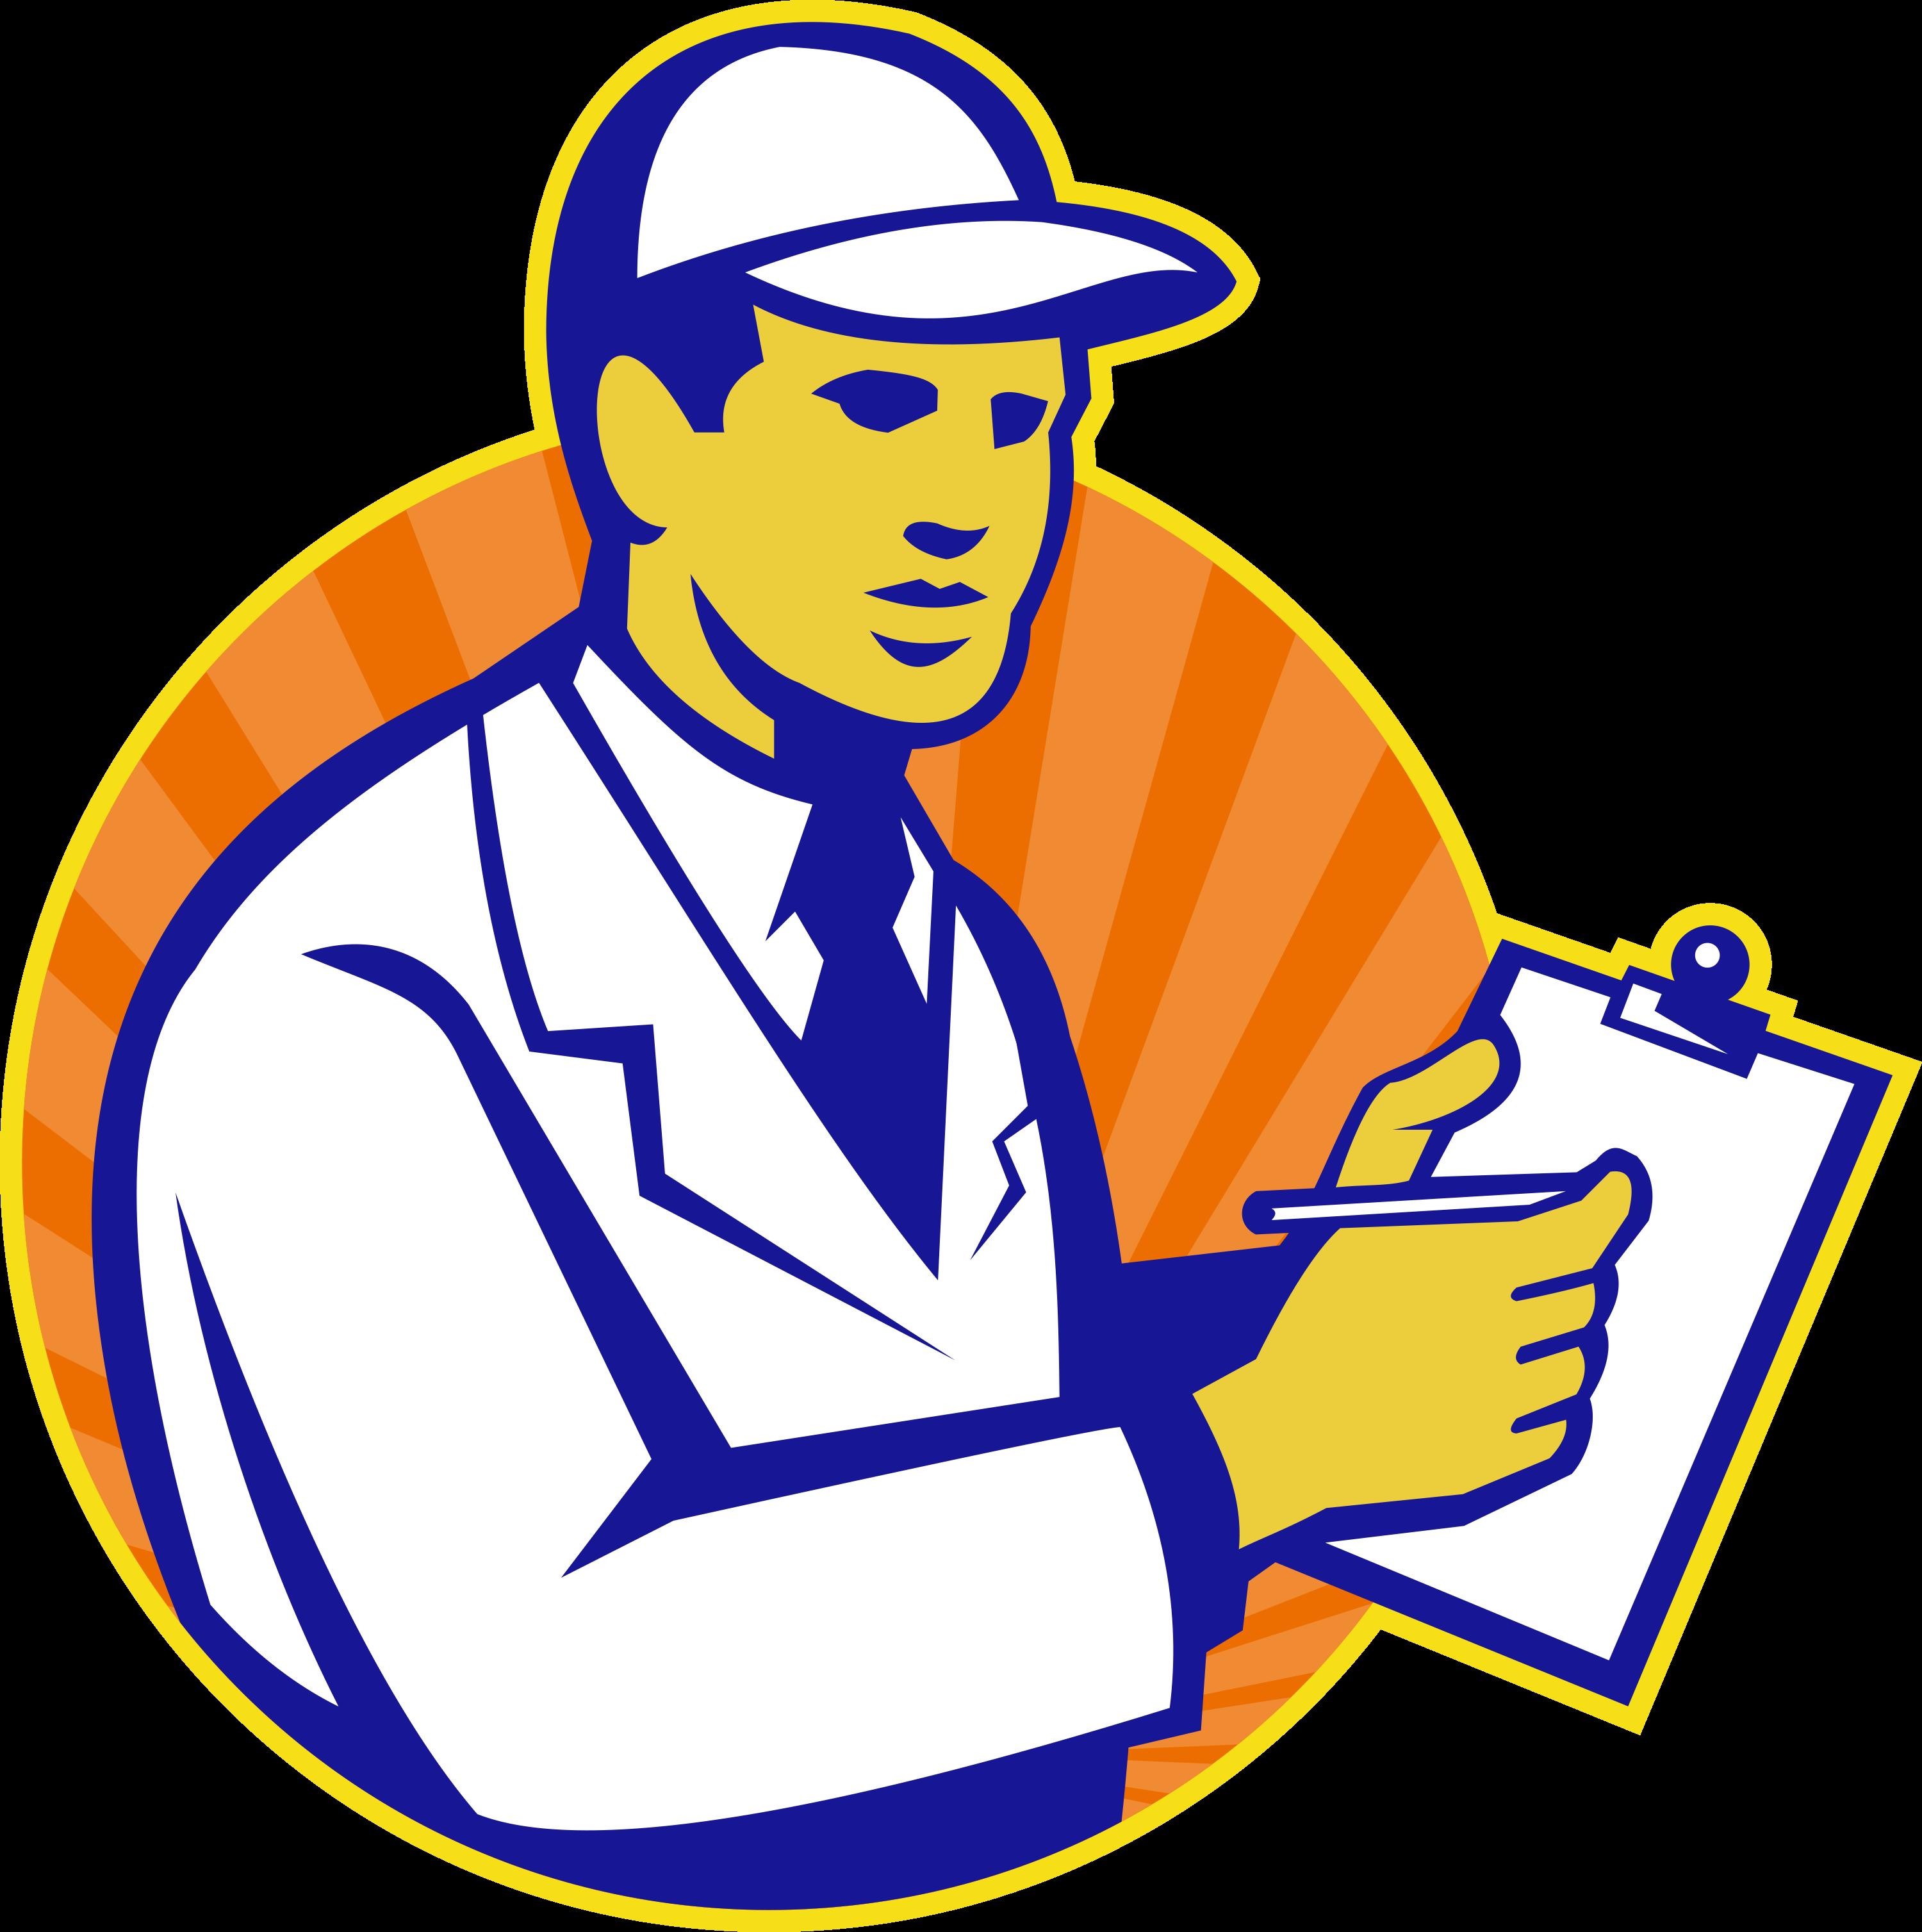 Clipboard clipart inspector. Blog visuacorp com led